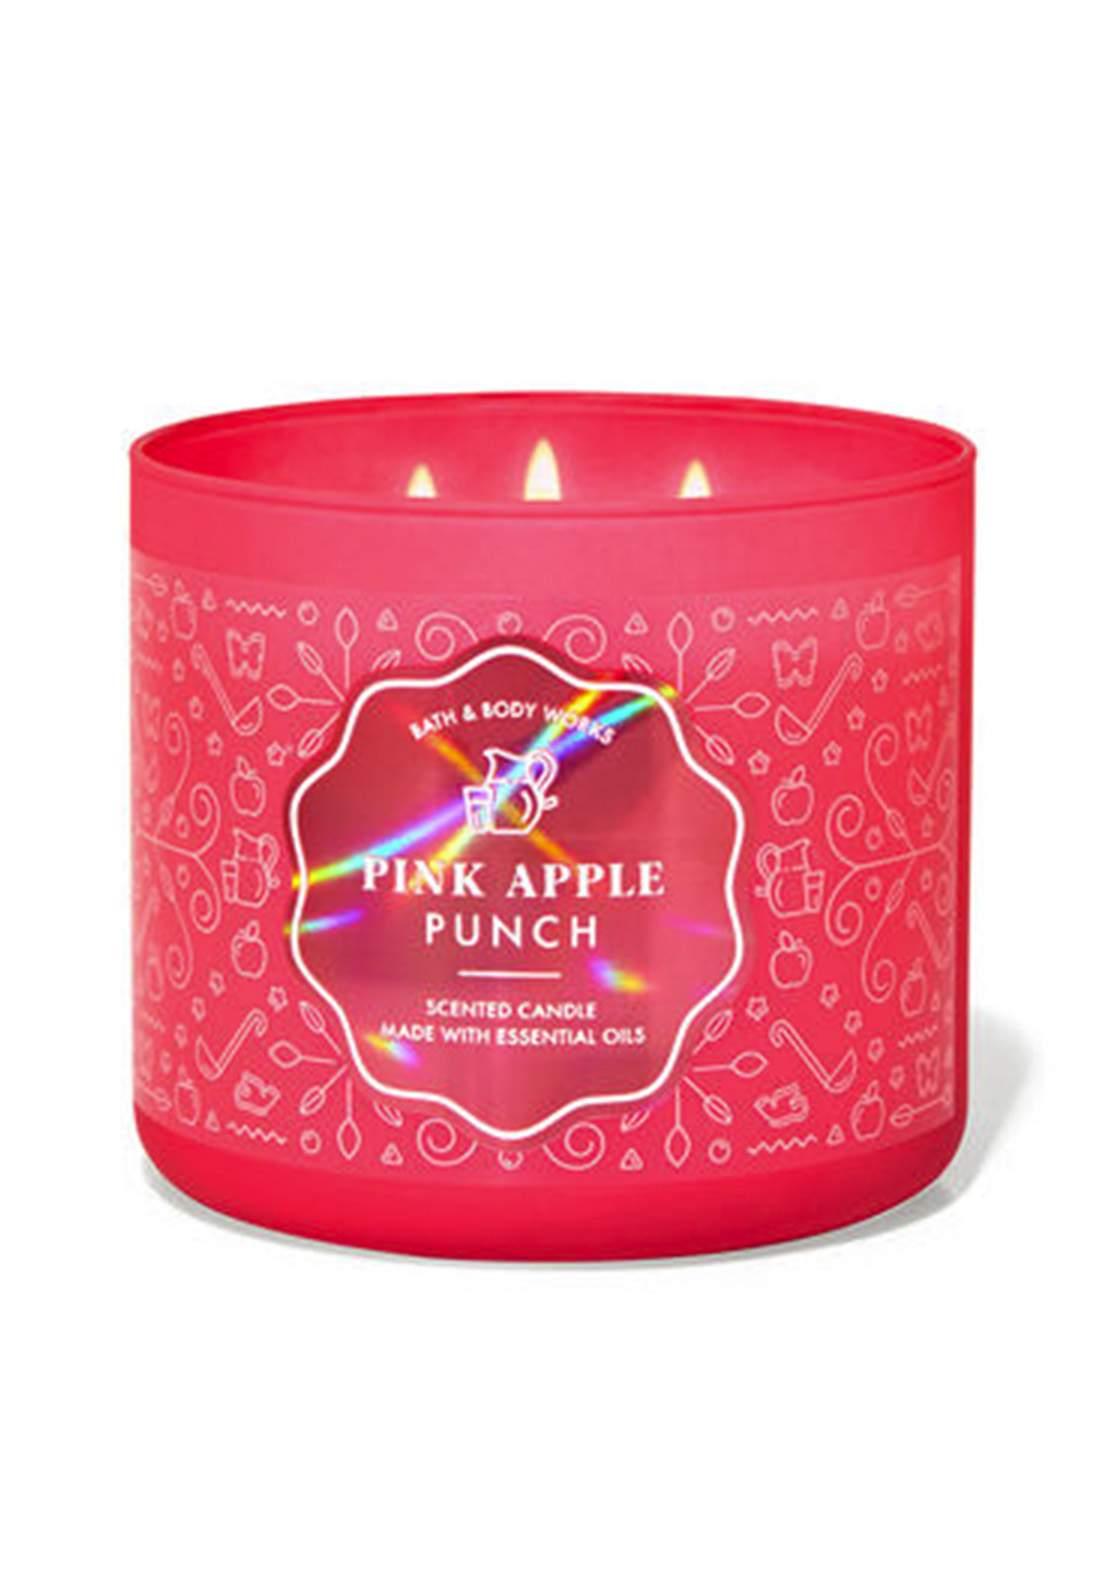 Bath & Body Works Pink Apple Punch 3-Wick Candle 411gm شمعة معطرة